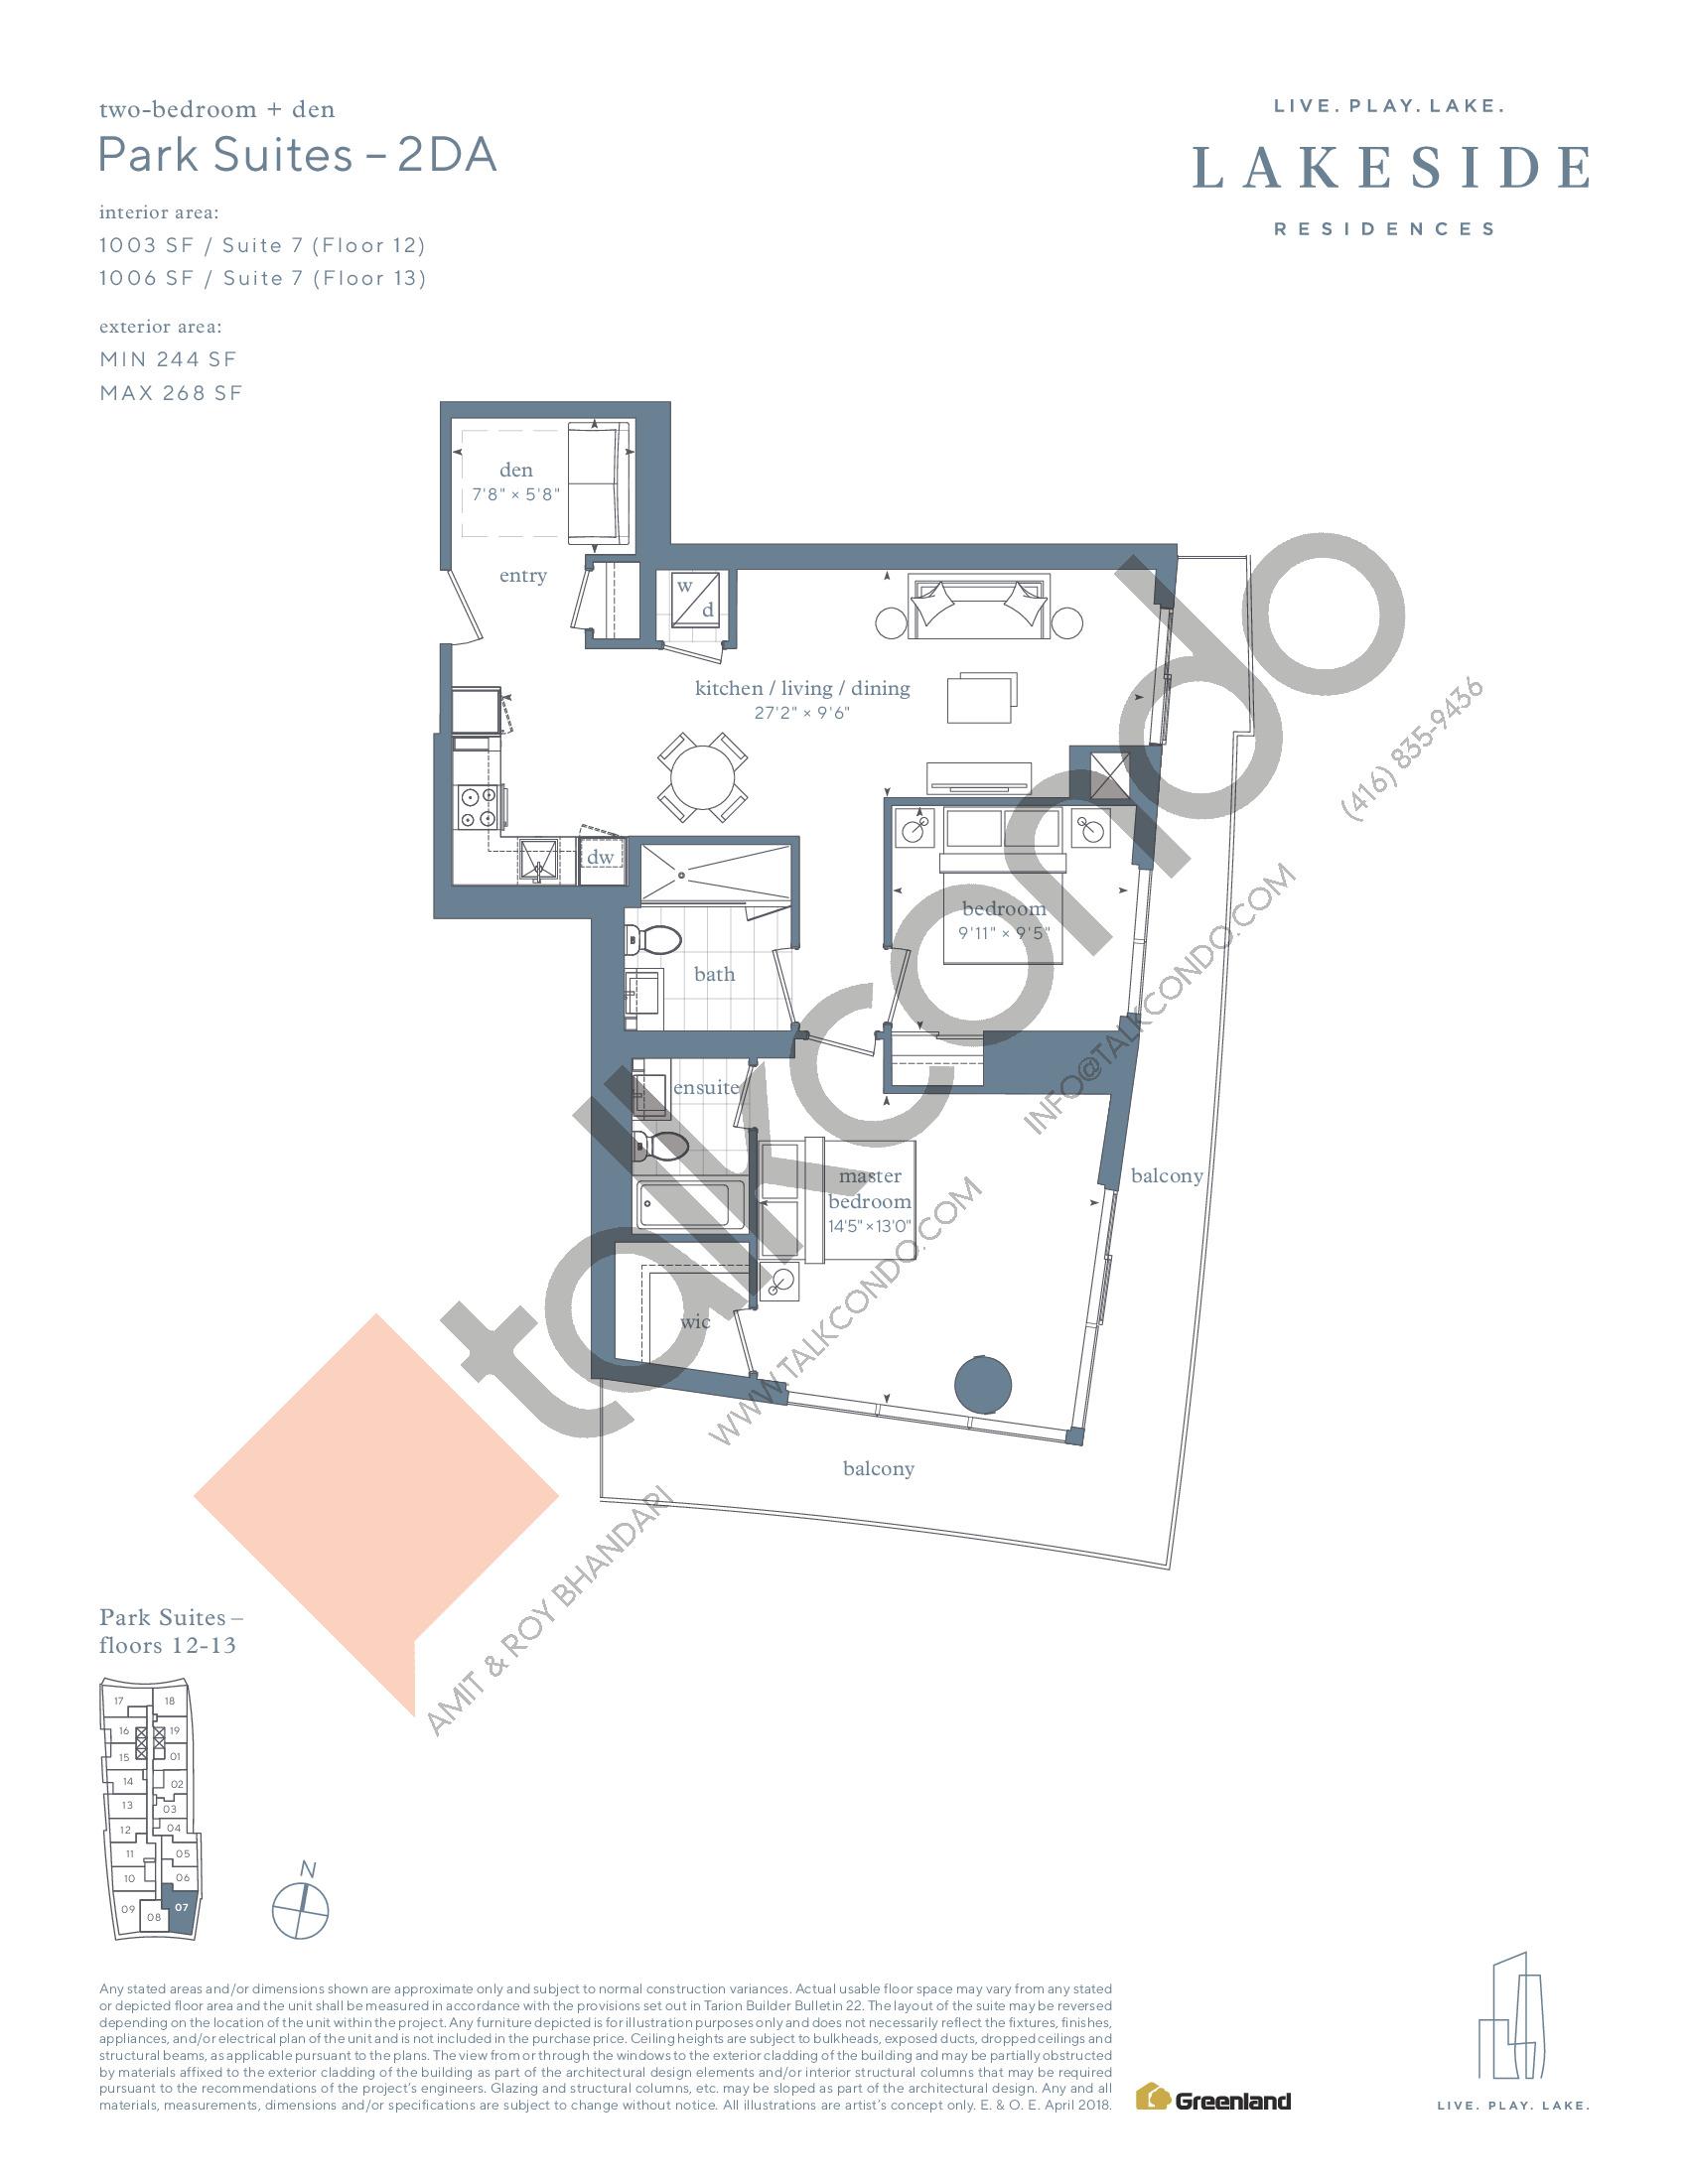 Park Suites - 2DA Floor Plan at Lakeside Residences - 1006 sq.ft